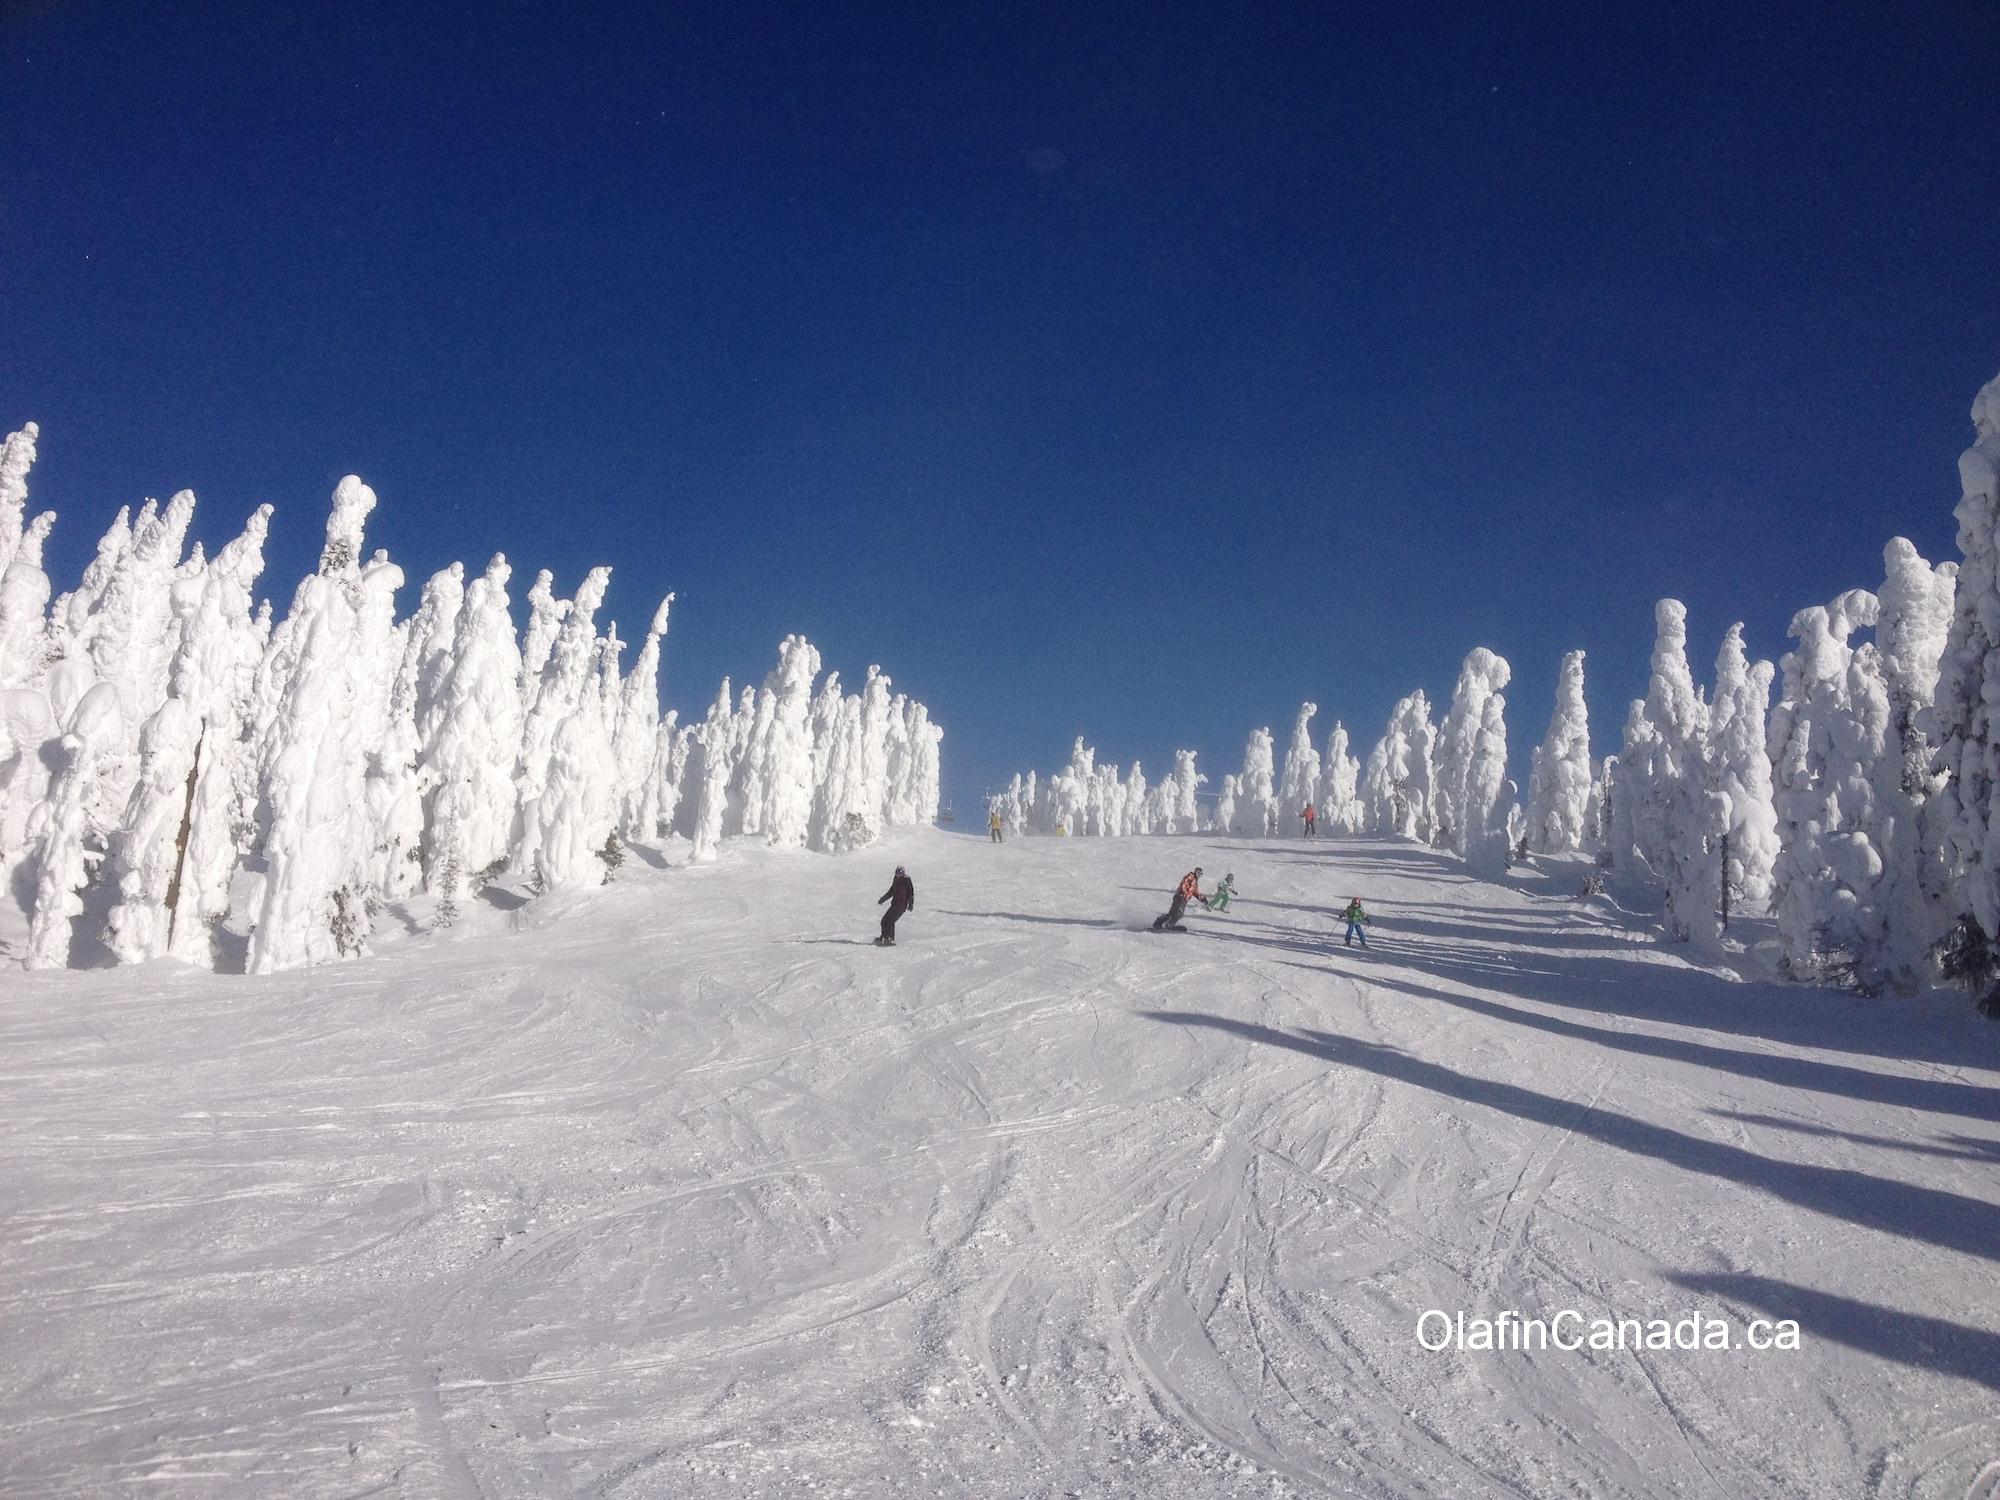 Skiing between the snow trees at Big White #olafincanada #britishcolumbia #discoverbc #bigwhite #kelowna #sunshine #snowghosts